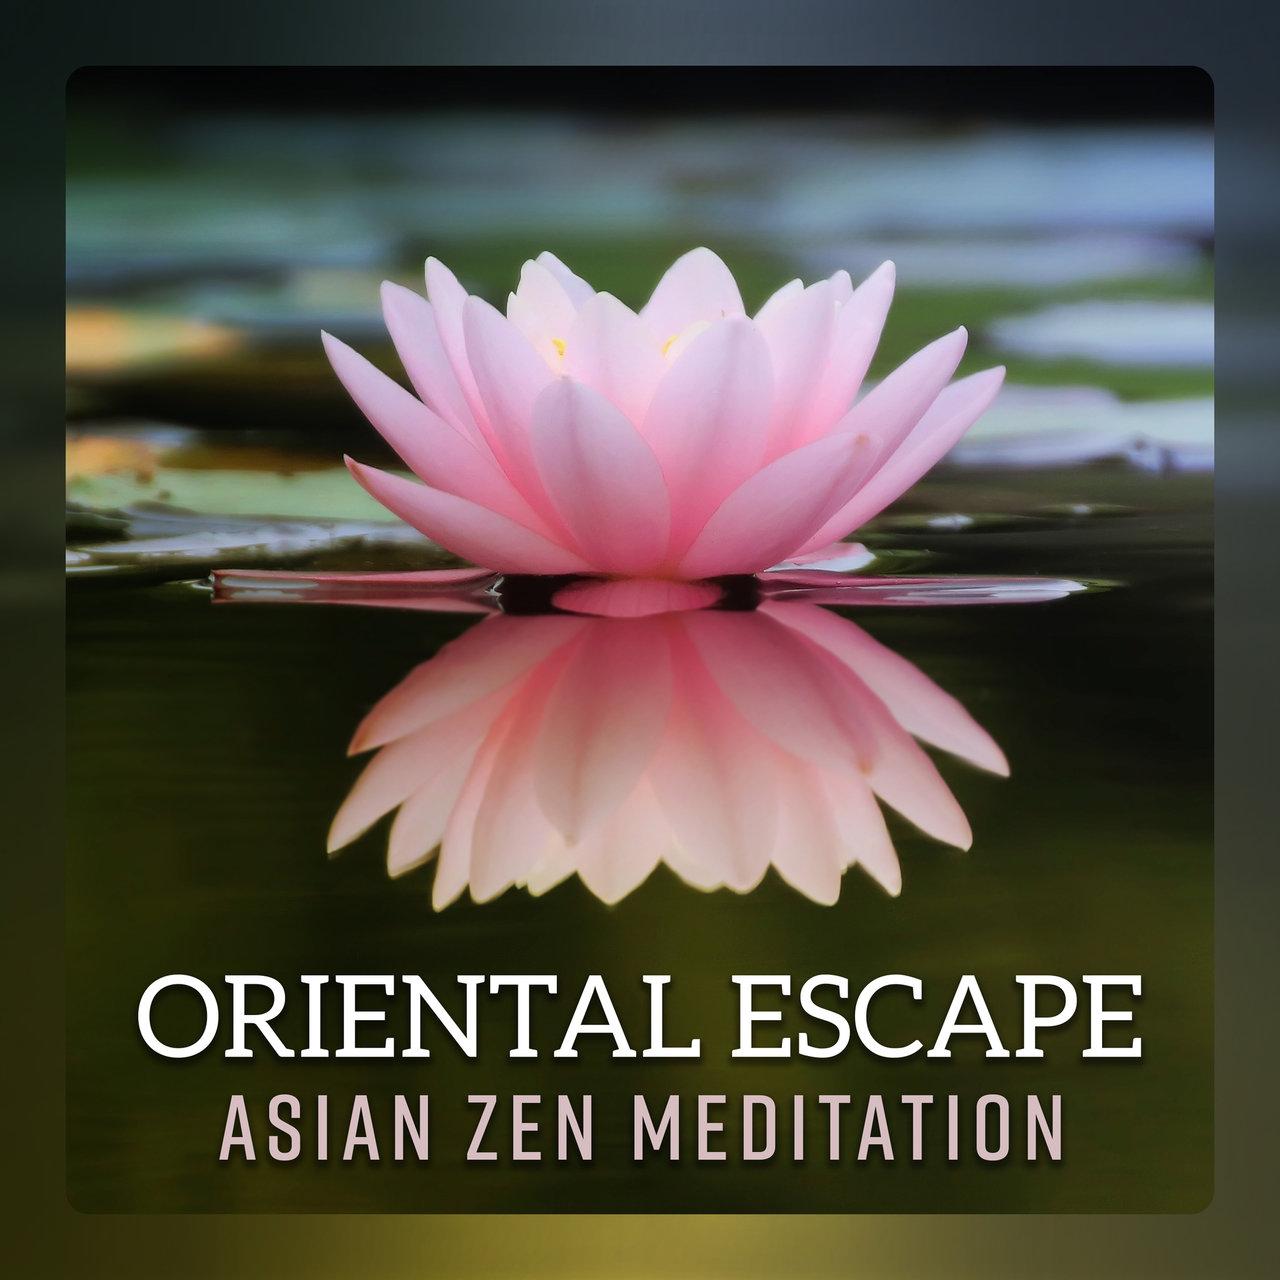 Tidal listen to asian flute music oasis on tidal oriental escape asian zen meditation music japanese chill healing yoga guzheng izmirmasajfo